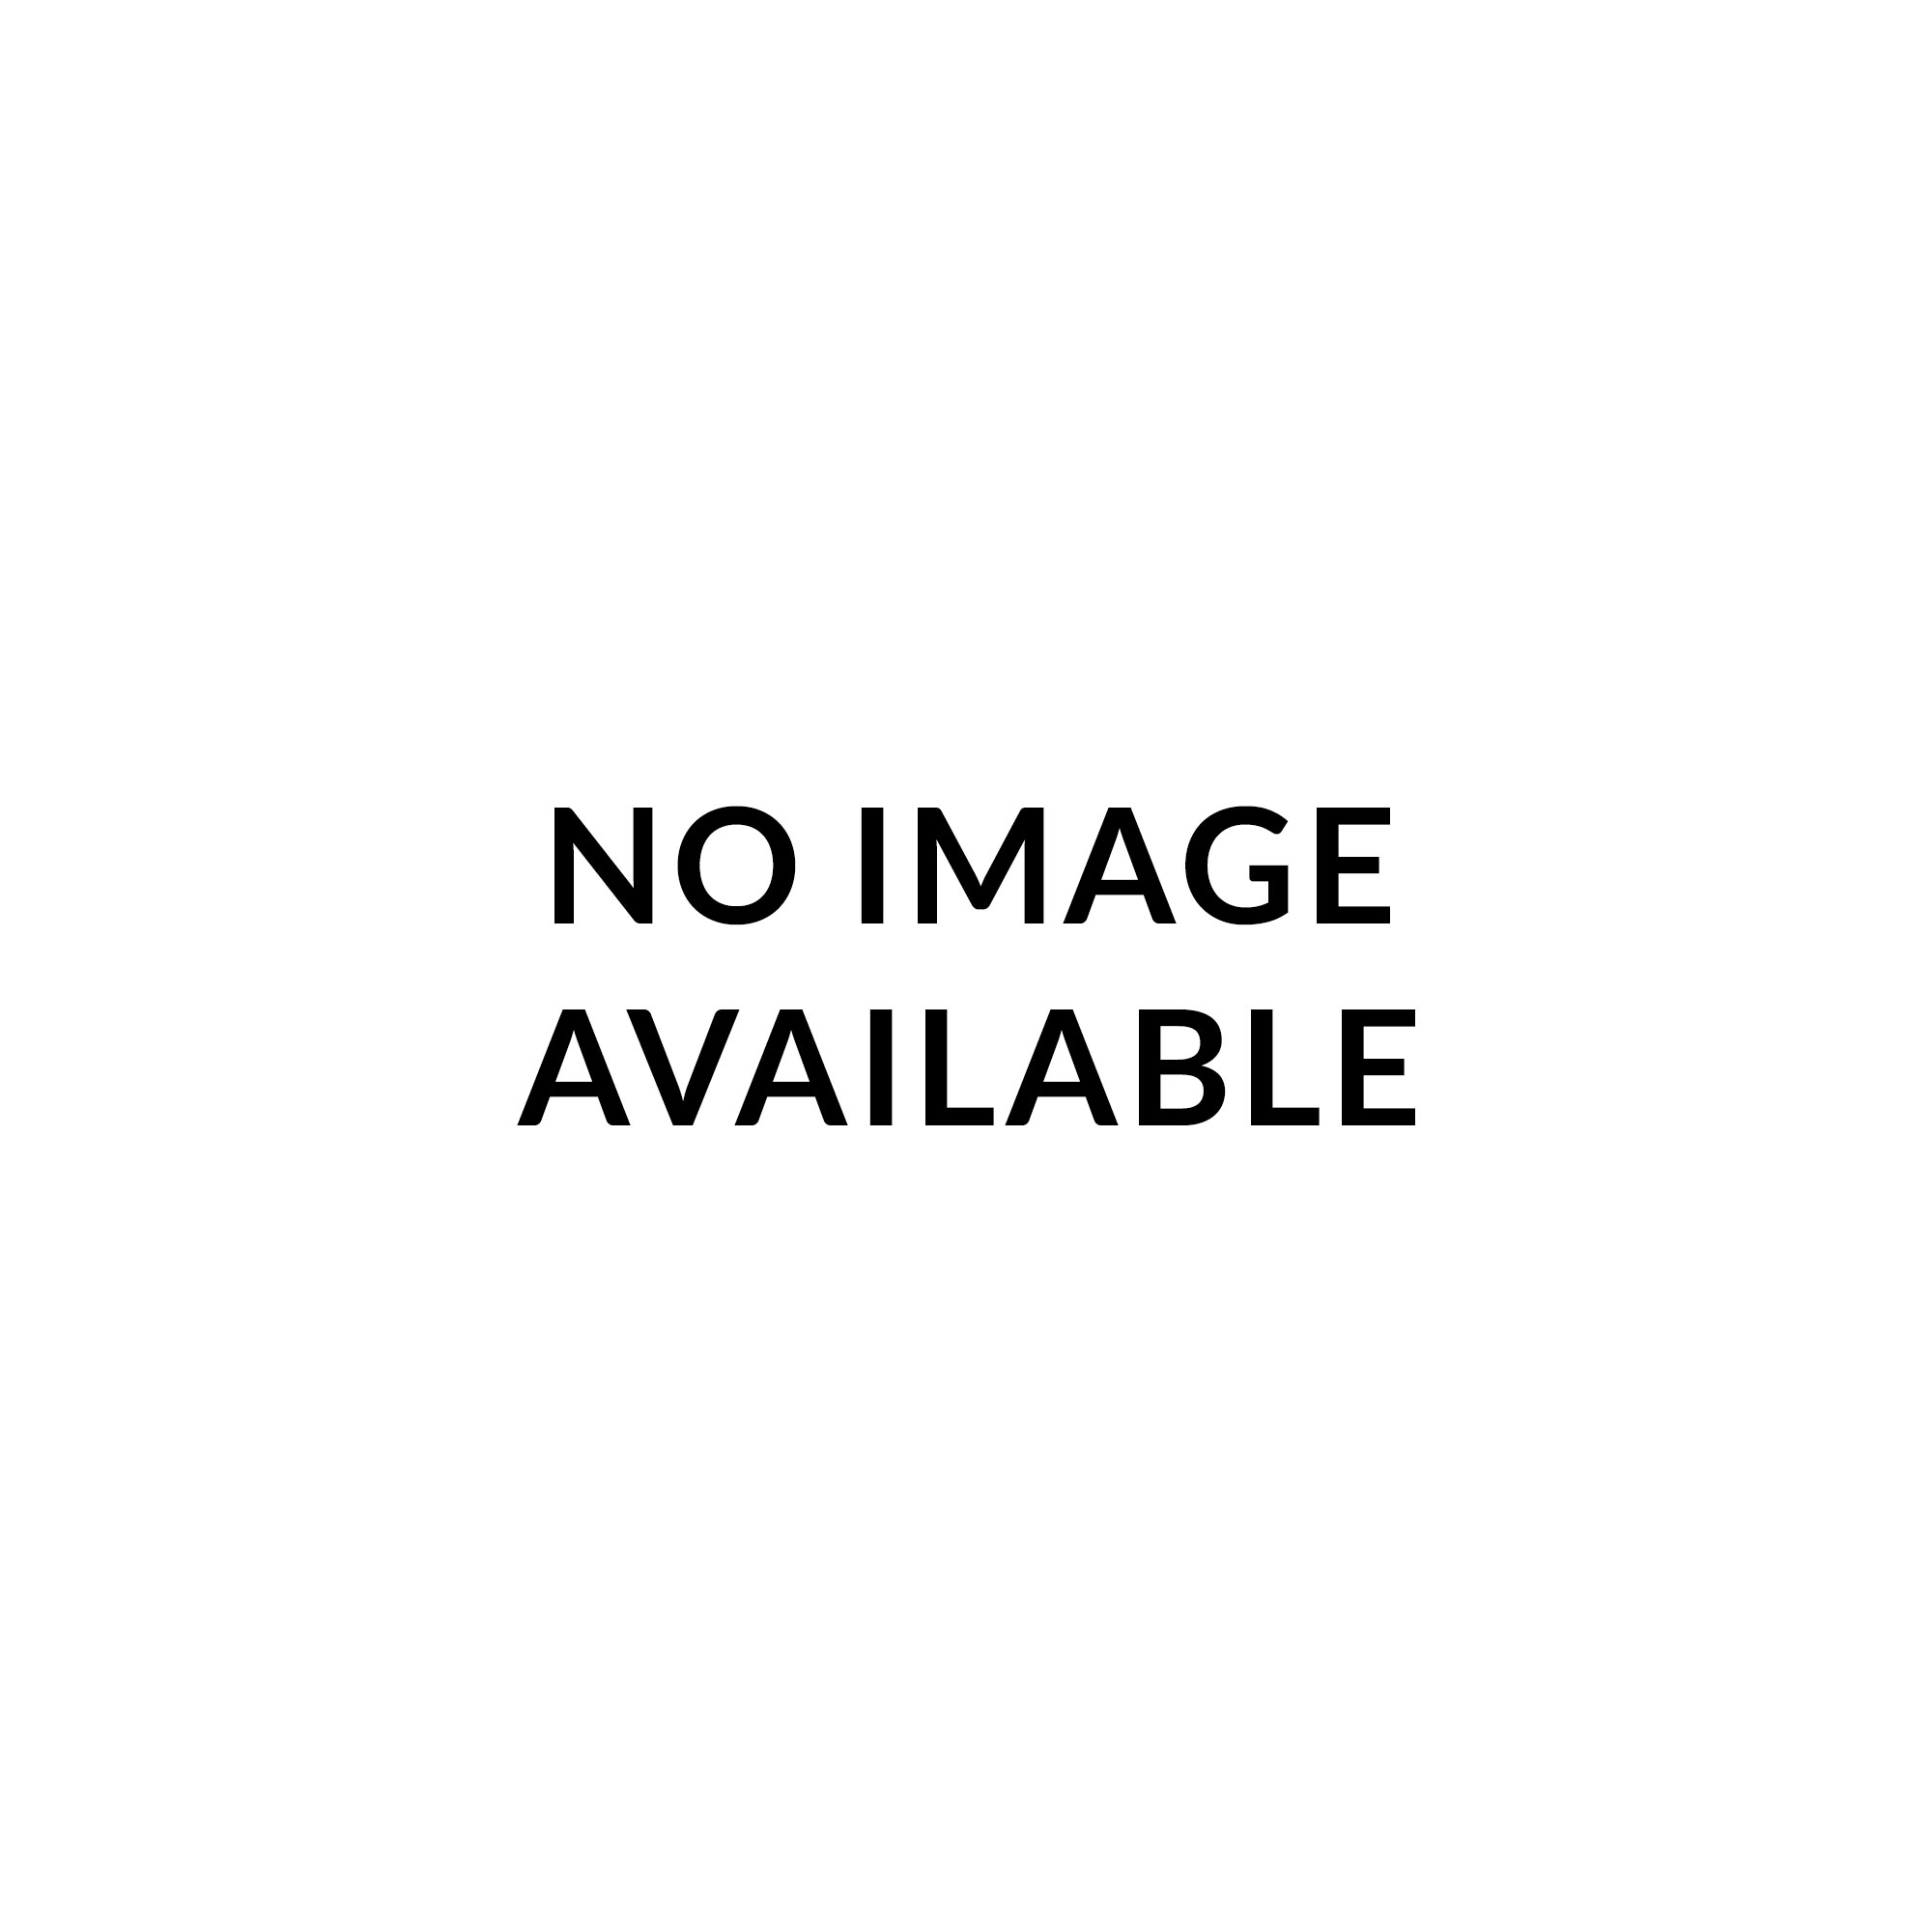 LaBella Hard Rockin Steel Nickel-Plated 9-46 Electric Strings